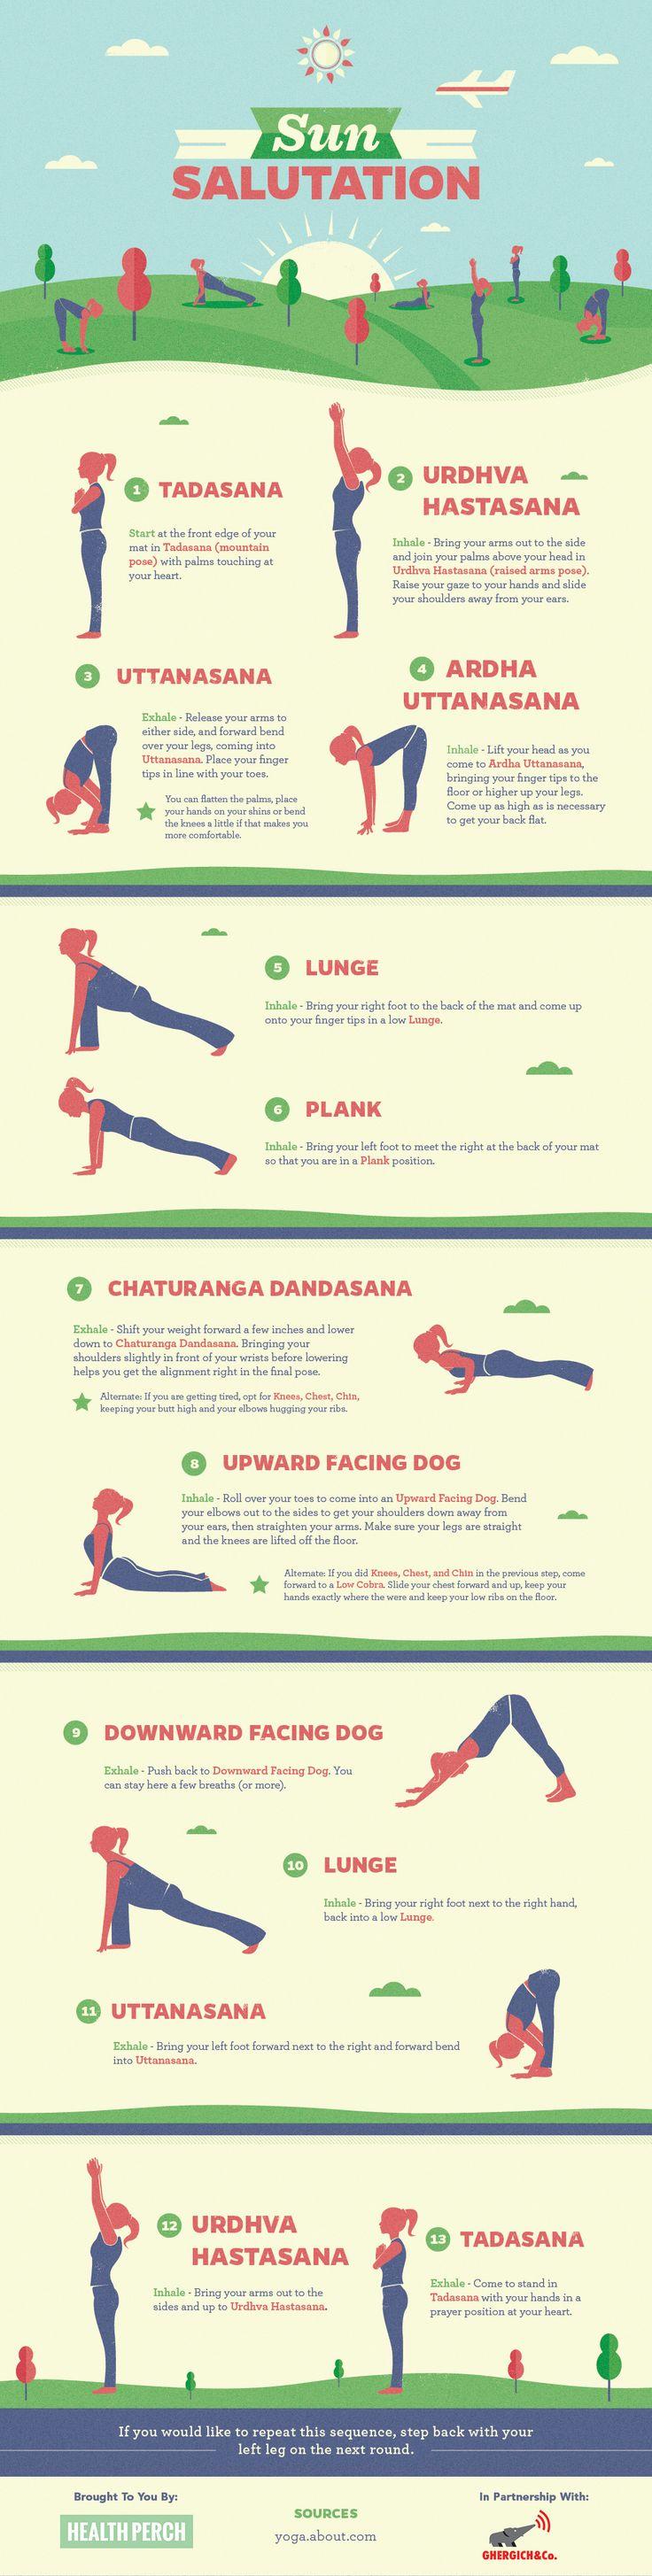 Infographic: How To Do Sun Salutation #Yoga: http://blog.gaiam.com/infographic-how-to-do-sun-salutation/